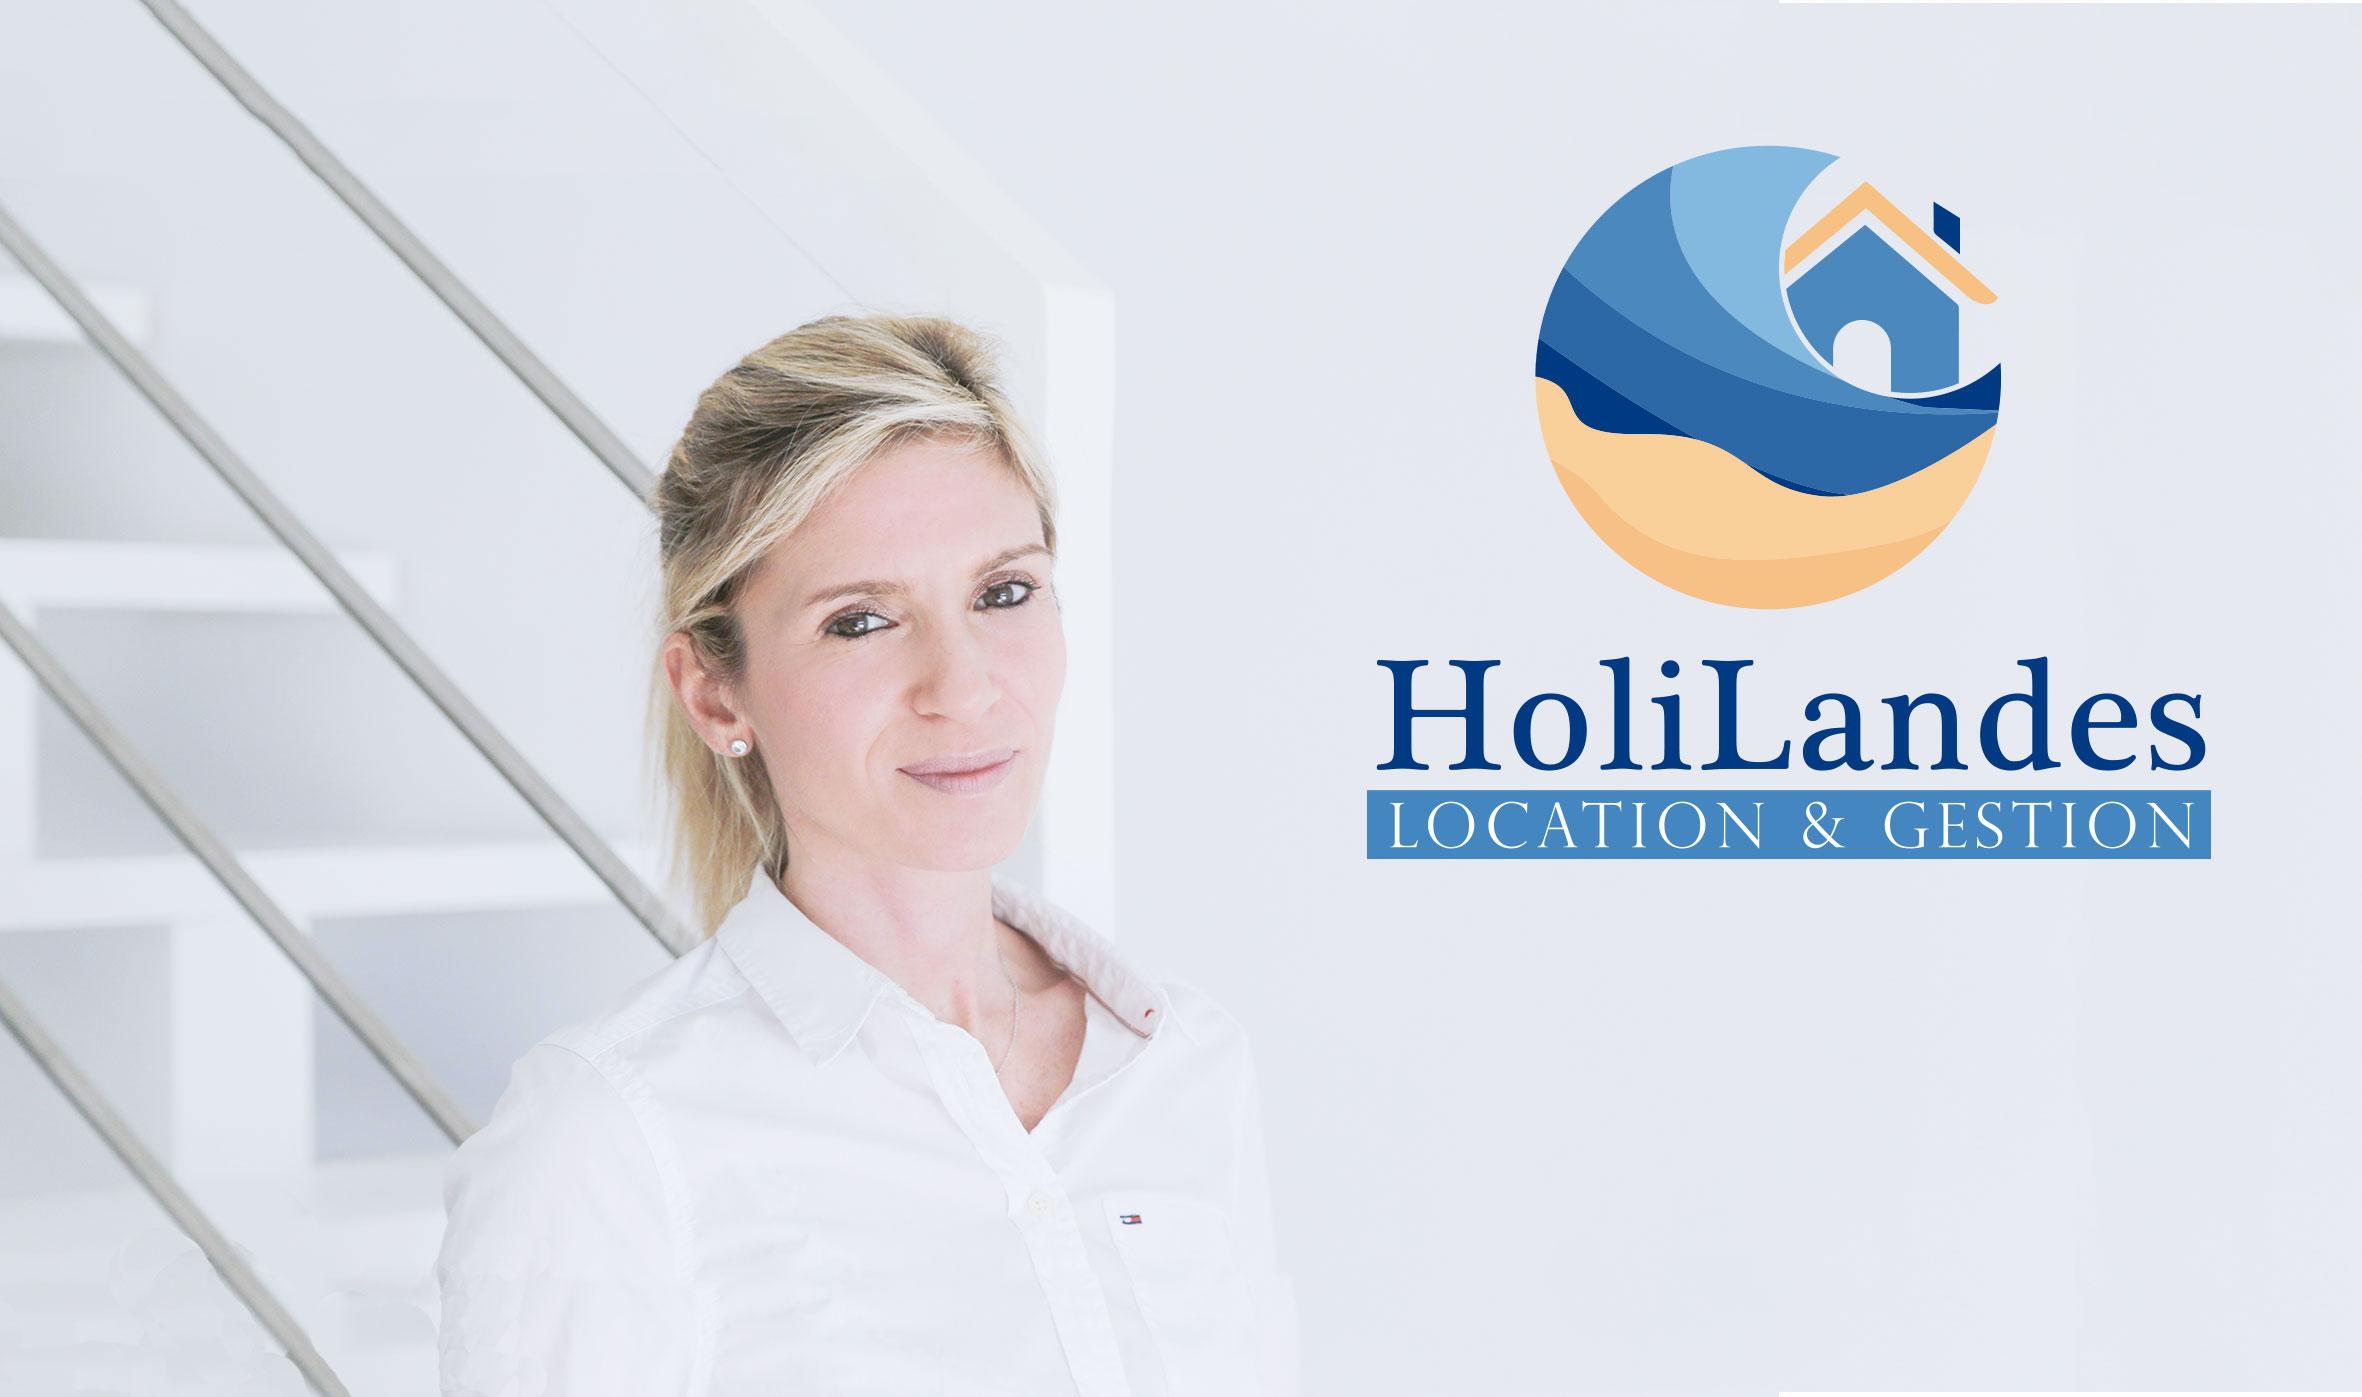 portrait-morgane-berard-holilandes-femmeblonde-hossegor-capbreton-nlp-location-ouvreporte-acceuil-locataires-vacances